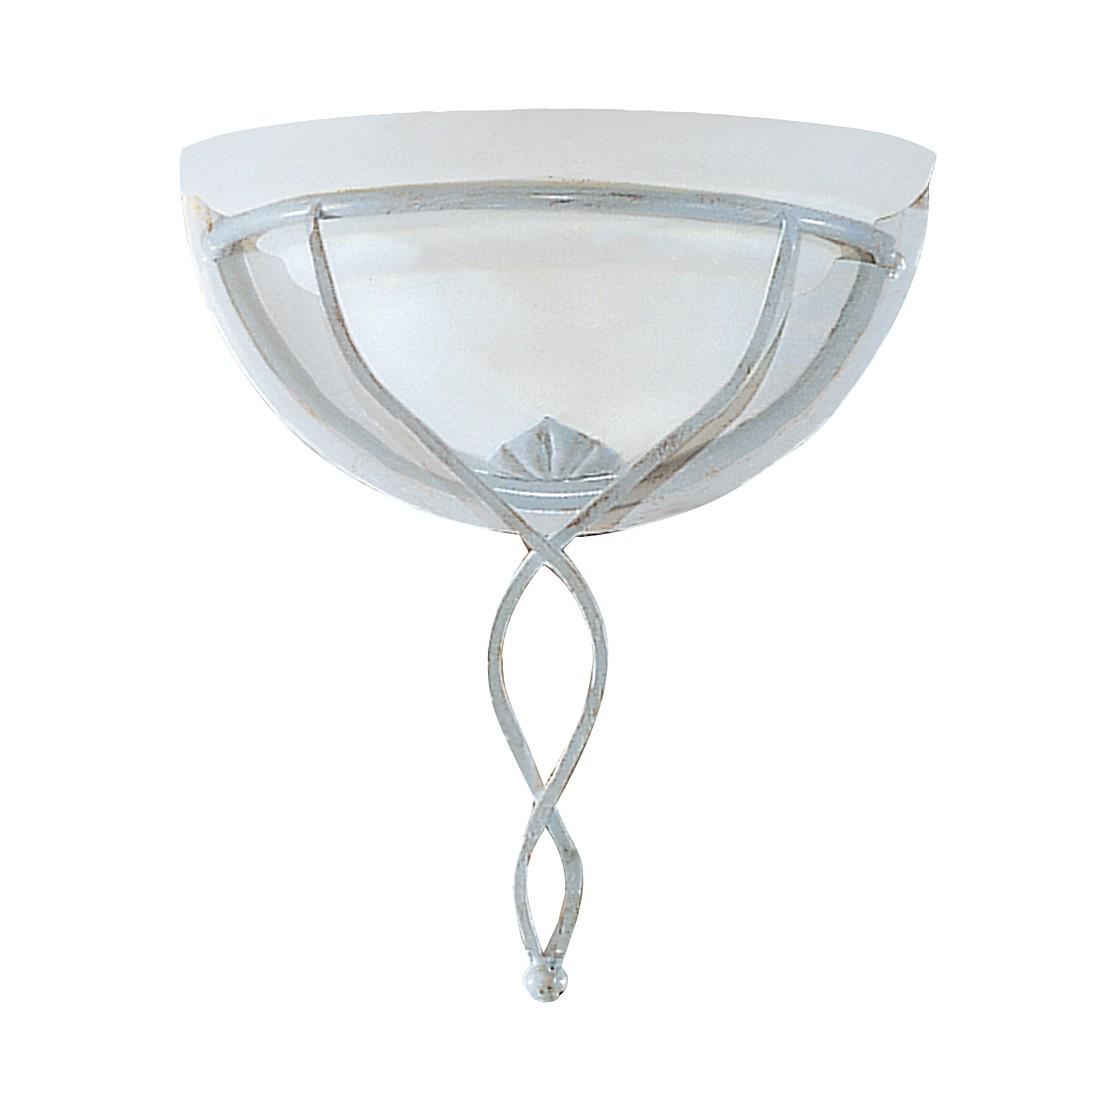 wandleuchte halbschale metall glas altwei gold wei 1 flammig hans k gl a online bestellen. Black Bedroom Furniture Sets. Home Design Ideas